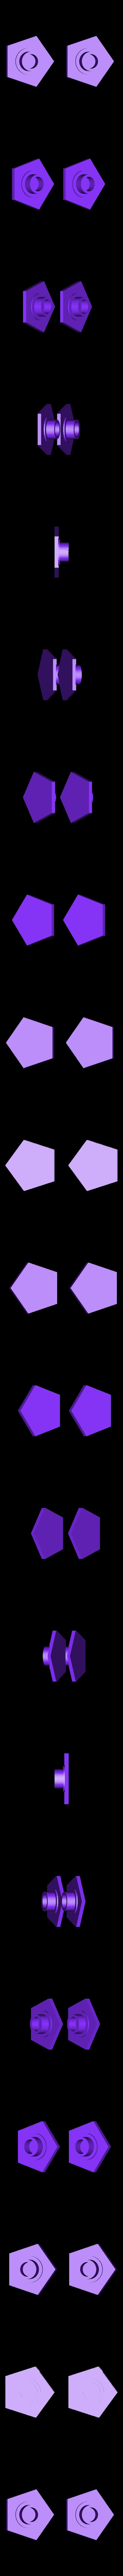 Example_608ZZ_5_Parametric_Fidget_Spinner_Cap.stl Download free STL file Customizable Fidget Spinner Cap • 3D printable design, MightyNozzle